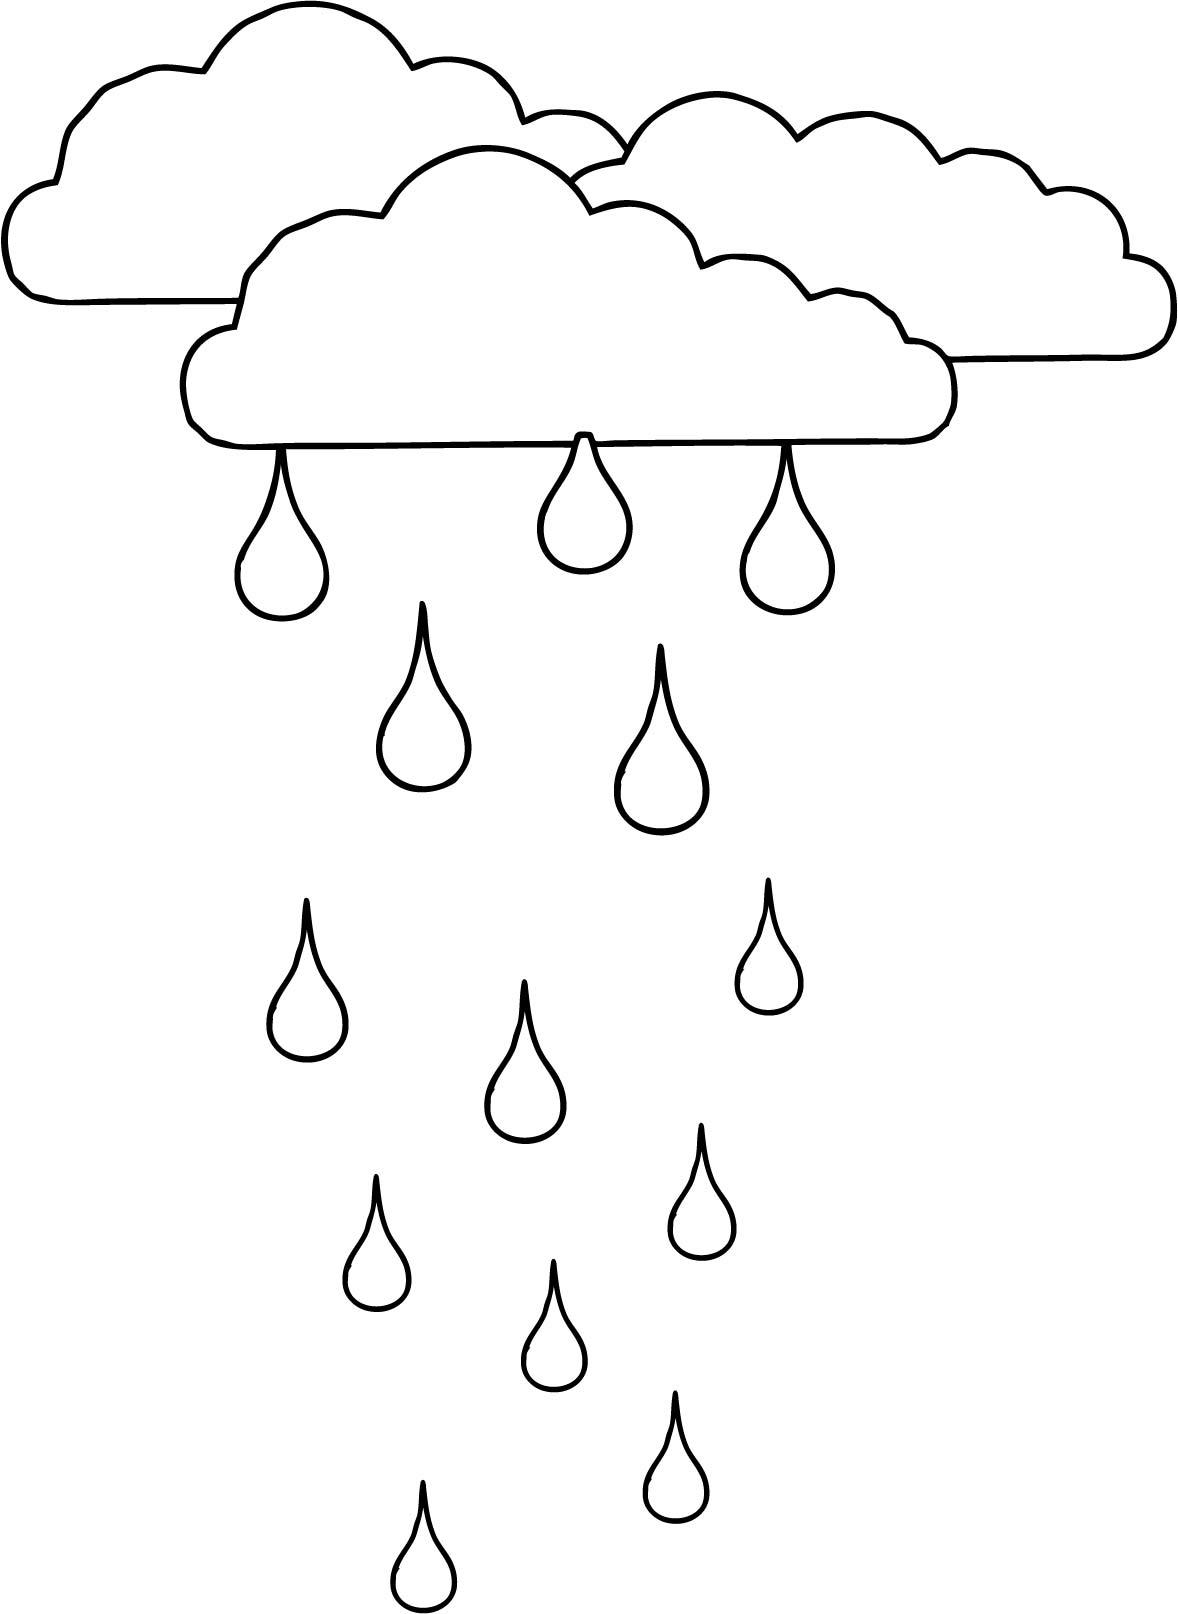 Rain Cloud Coloring Page At Getdrawings